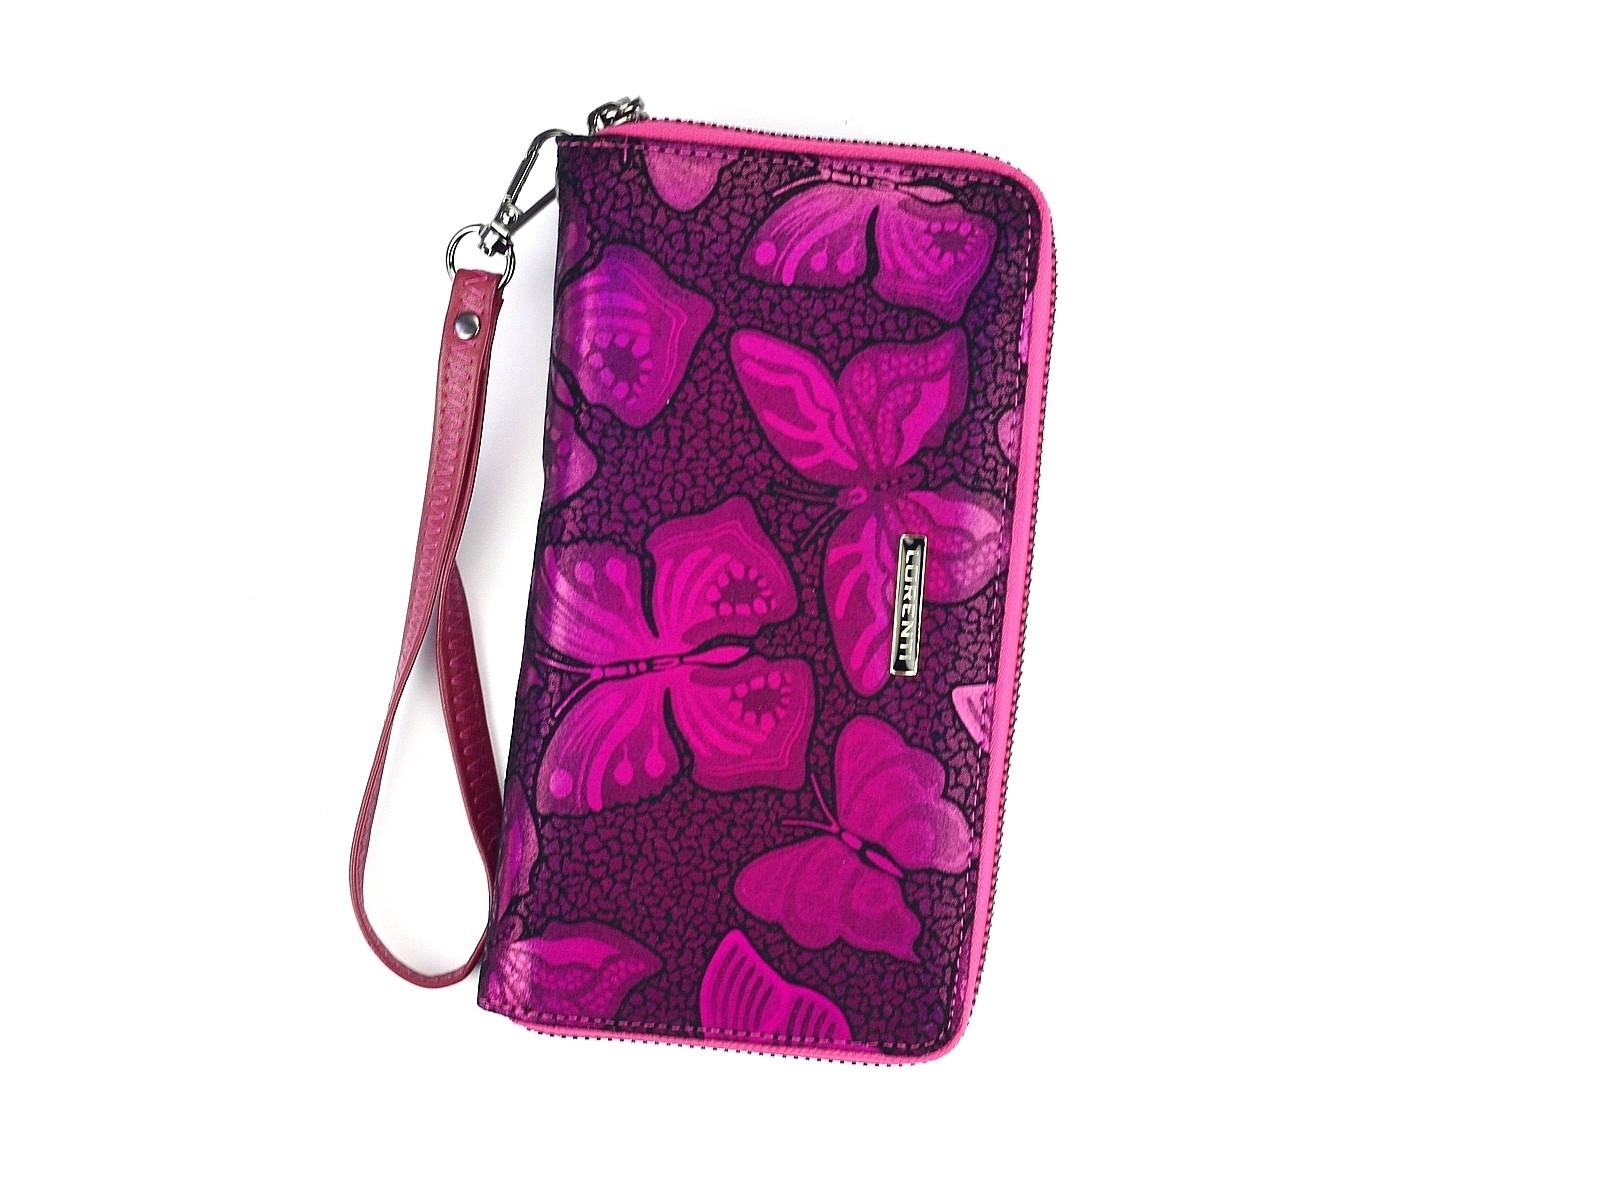 56a3d96bddc Dámská kožená peněženka Lorenti Sara - růžová